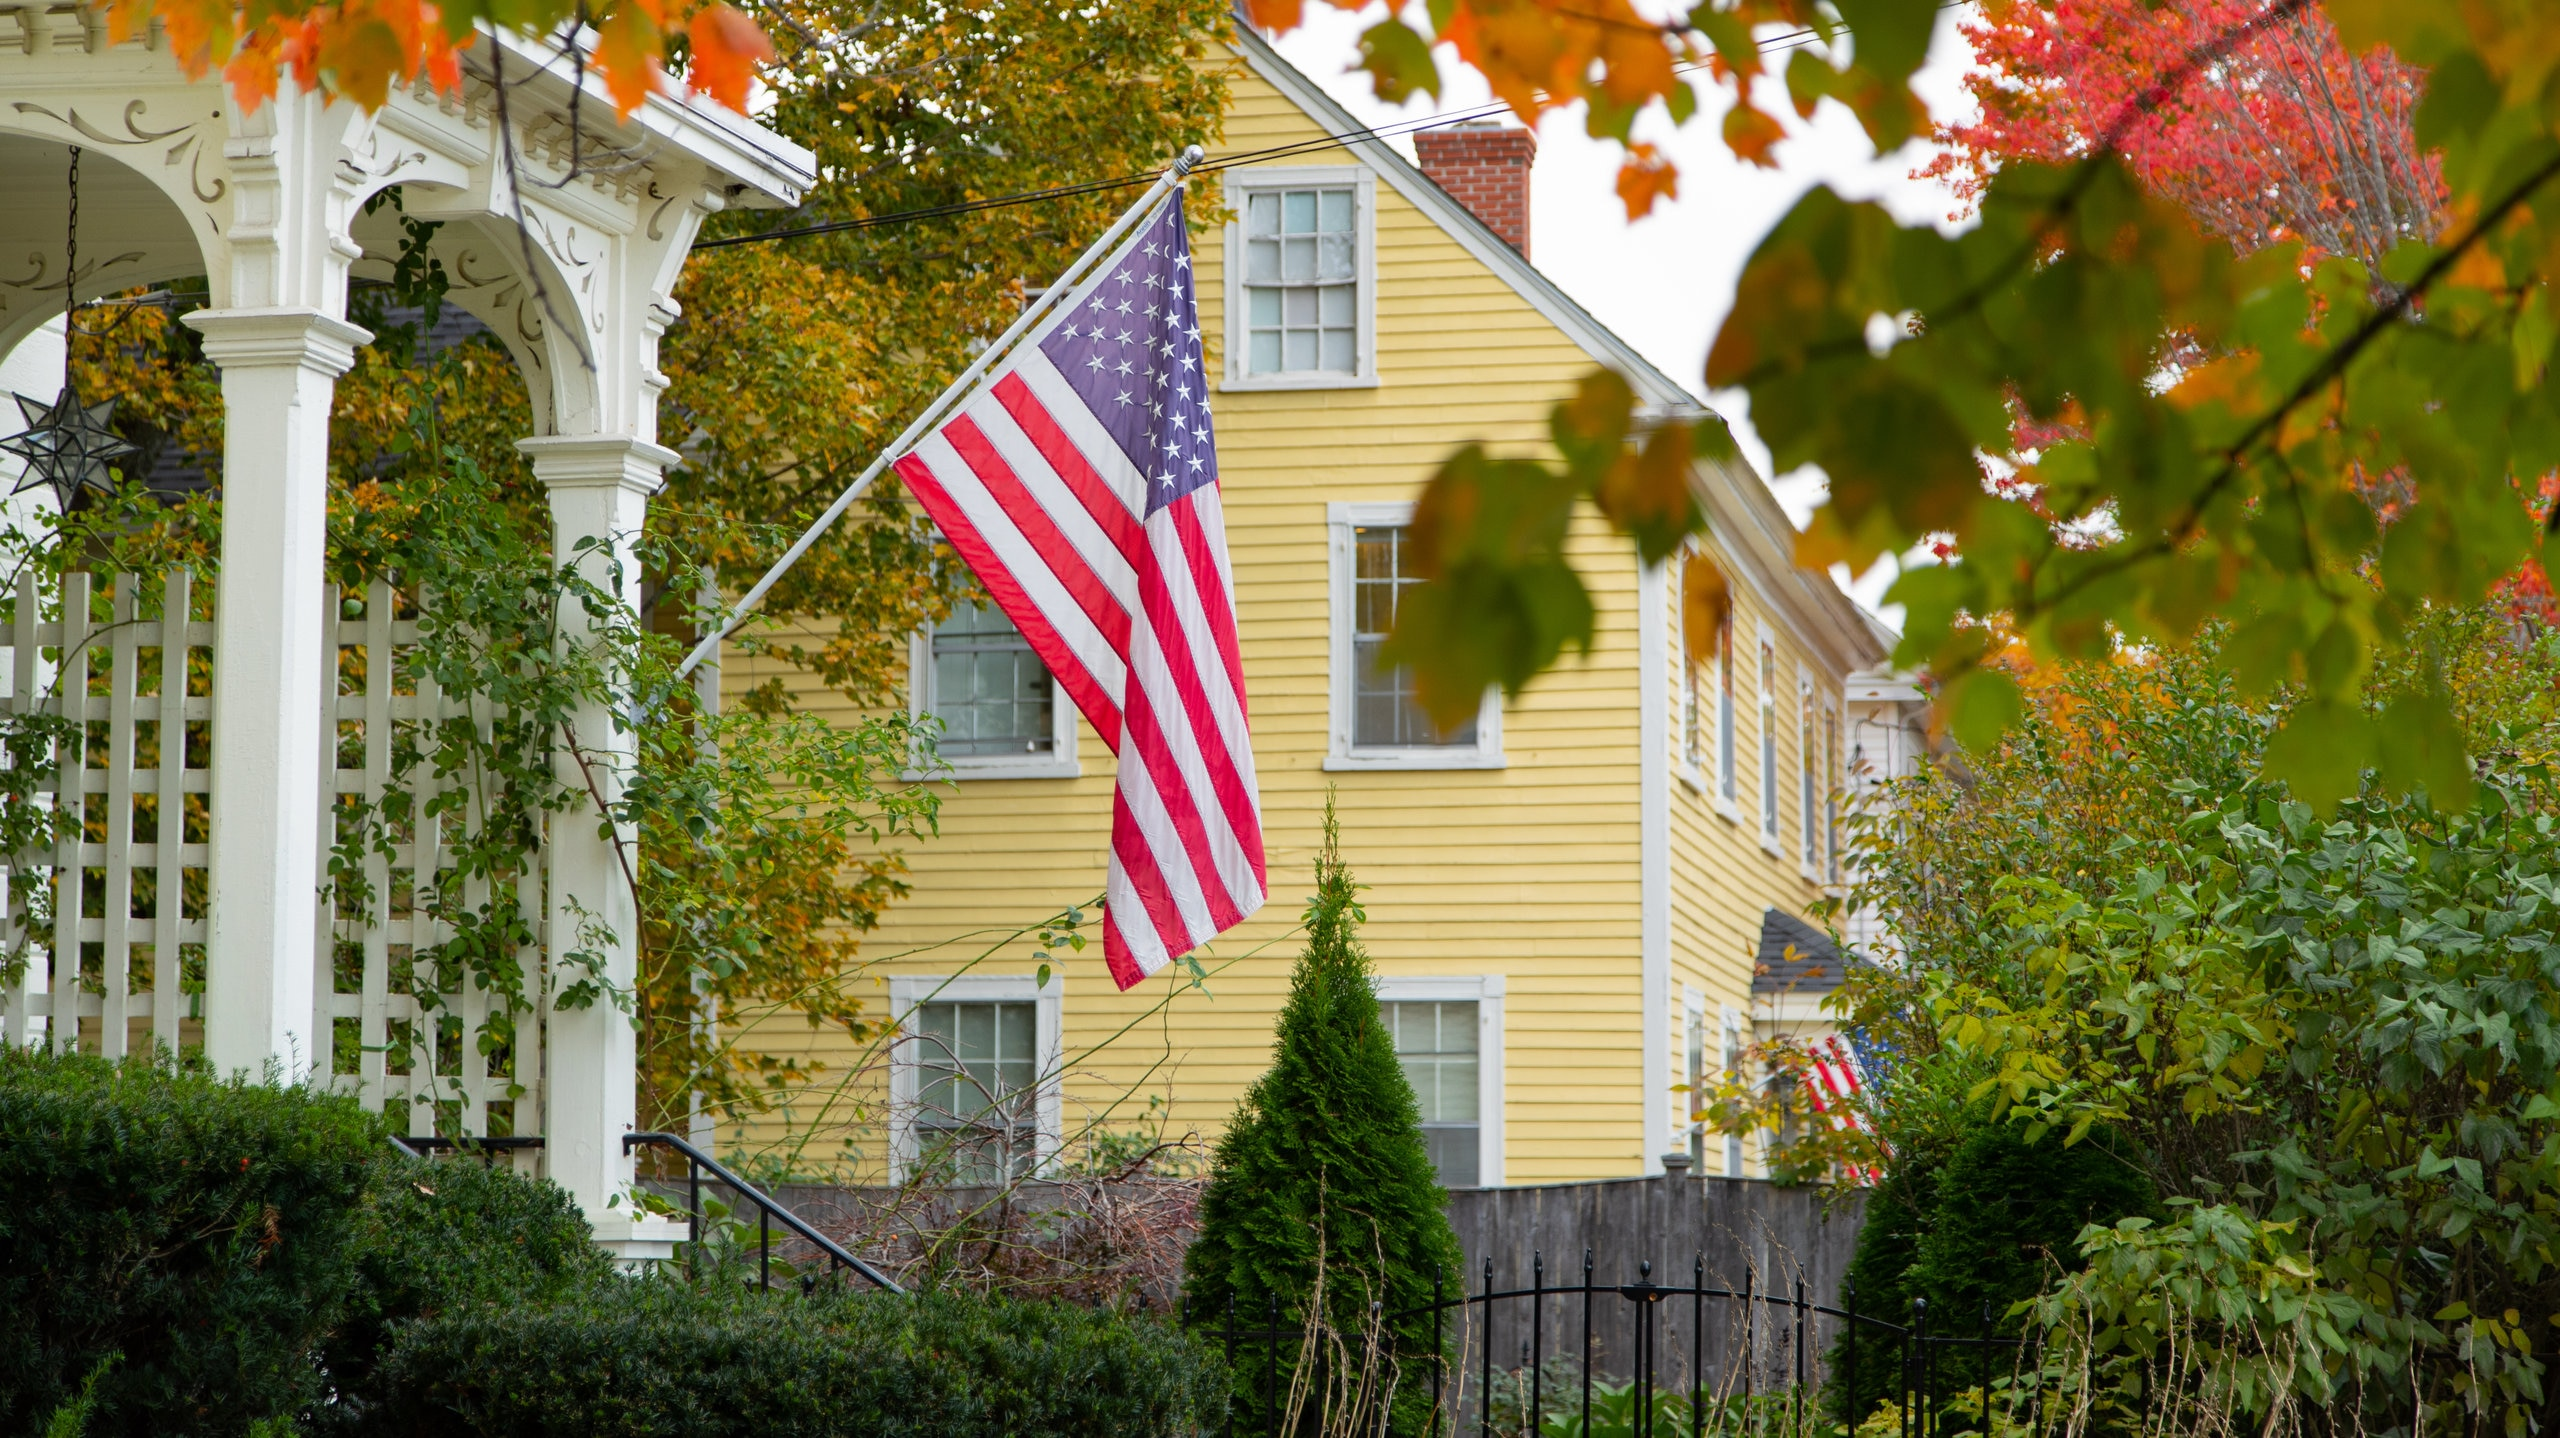 South Berwick, Maine, United States of America